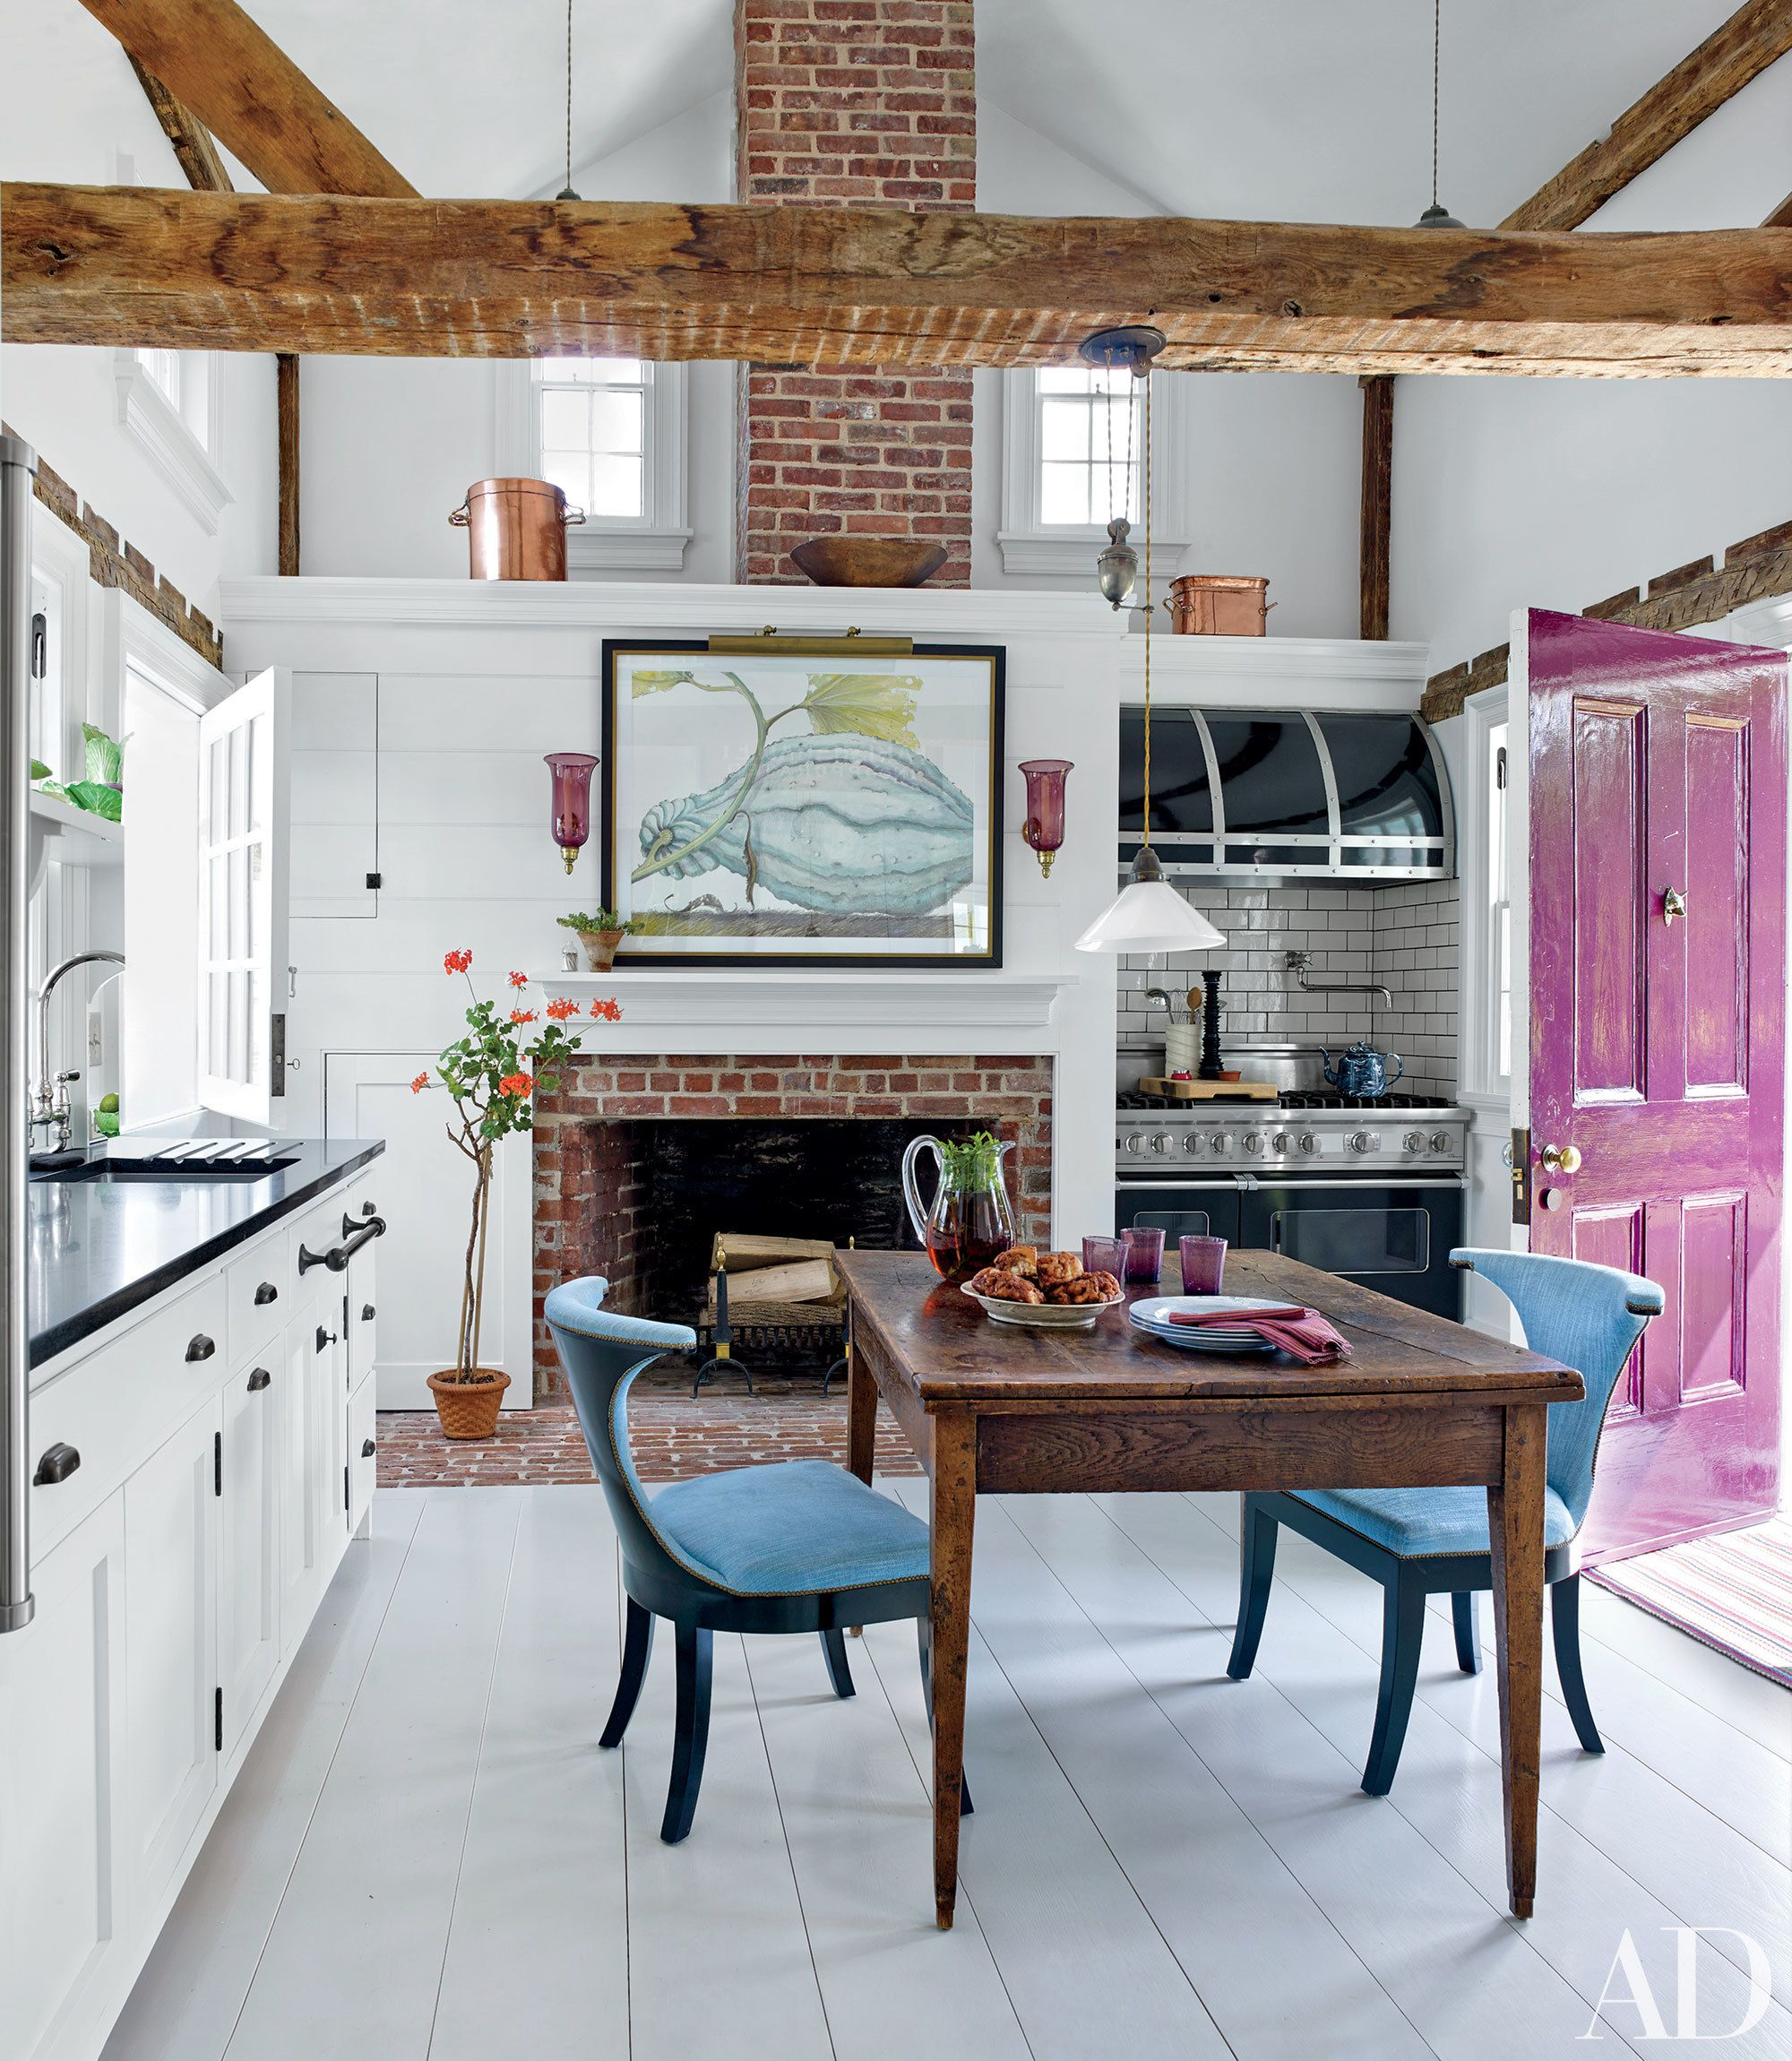 Cozy Kitchen Design Ideas: Warm Up Next To These Cozy Kitchen Fireplaces